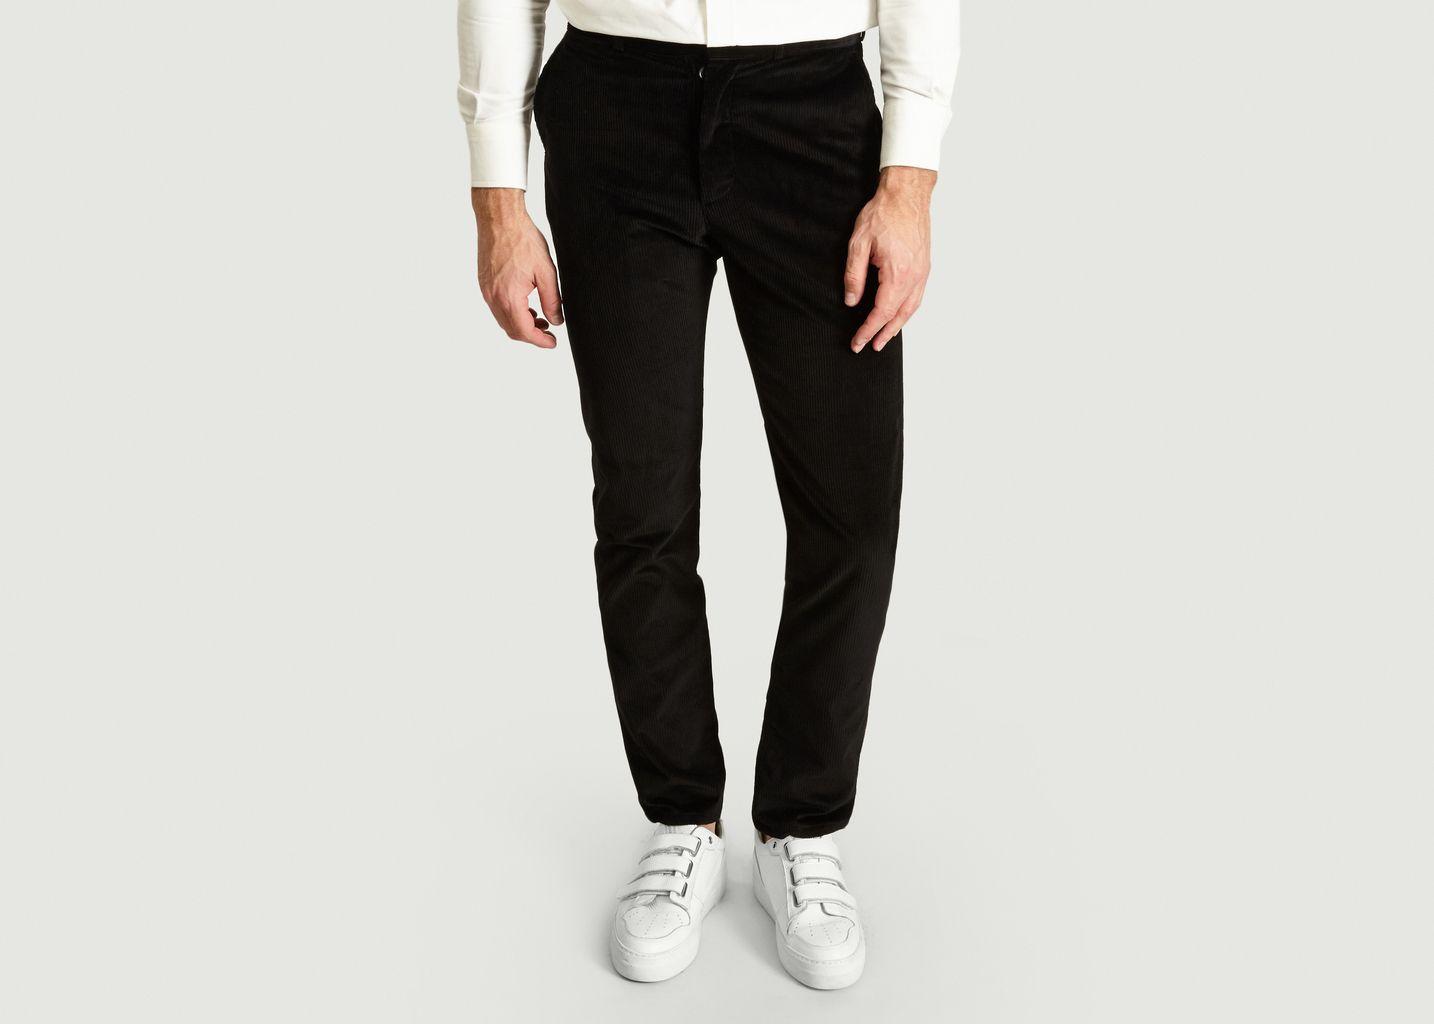 Pantalon Chino Parfait En Velours - Maison Kitsuné